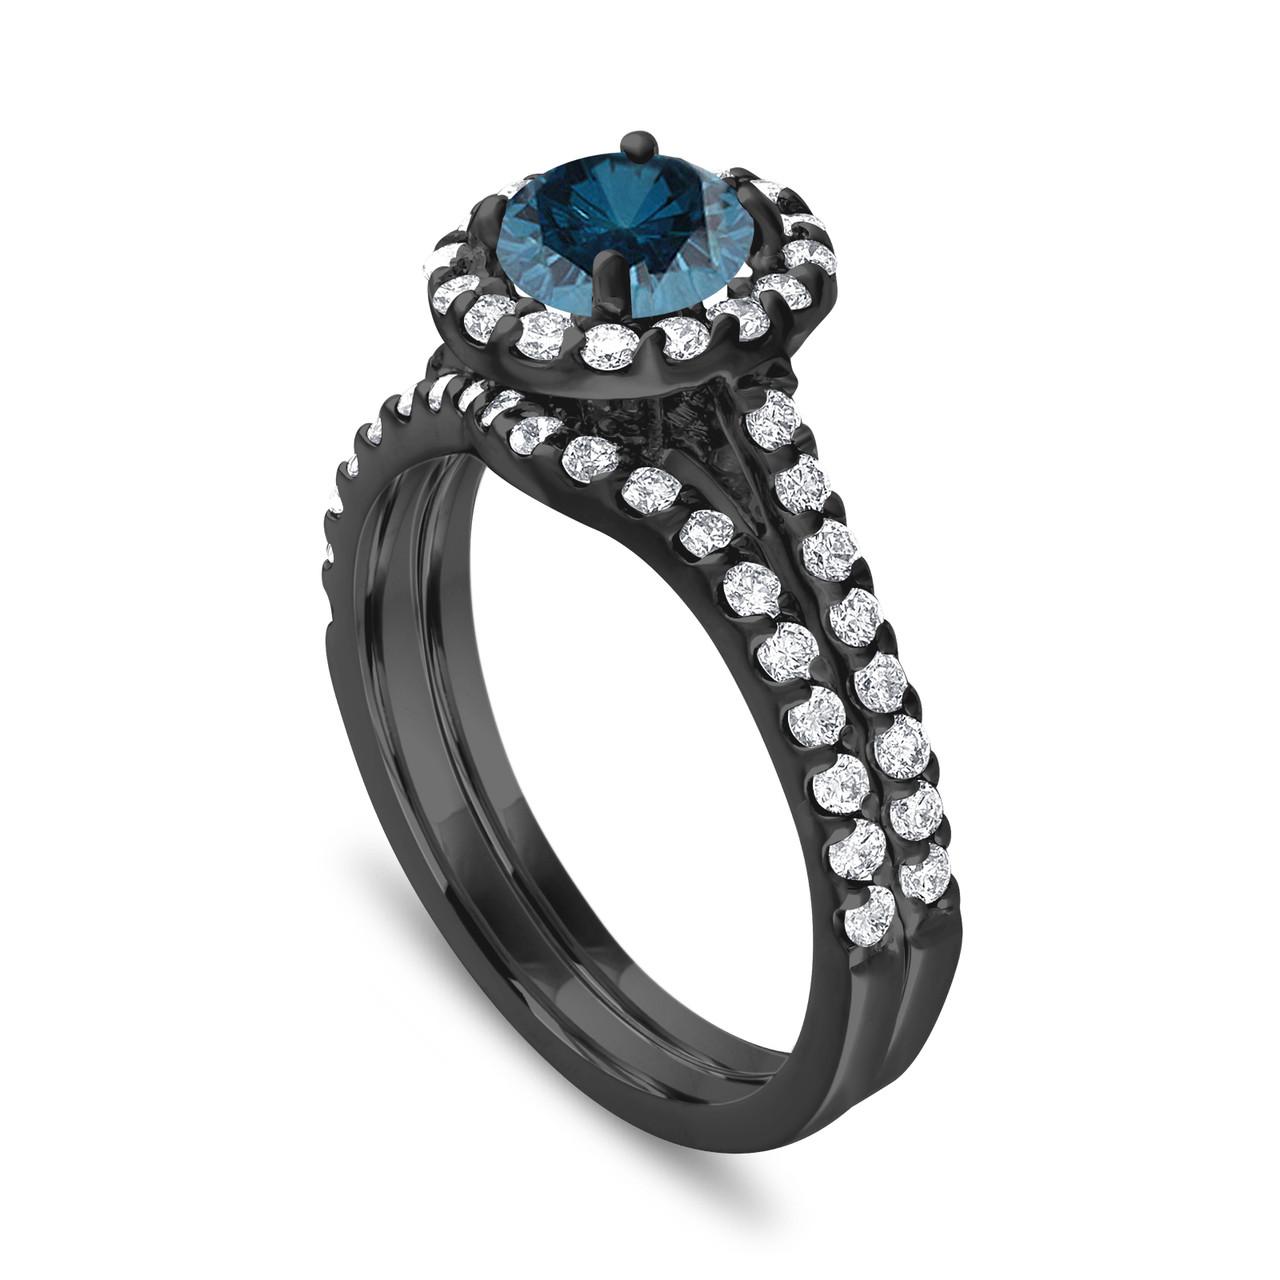 Blue Diamond Engagement Ring Set Wedding Ring Set Vintage Style Bridal Sets 1 84 Carat 14k Black Gold Unique Halo Pave Certified Handmade